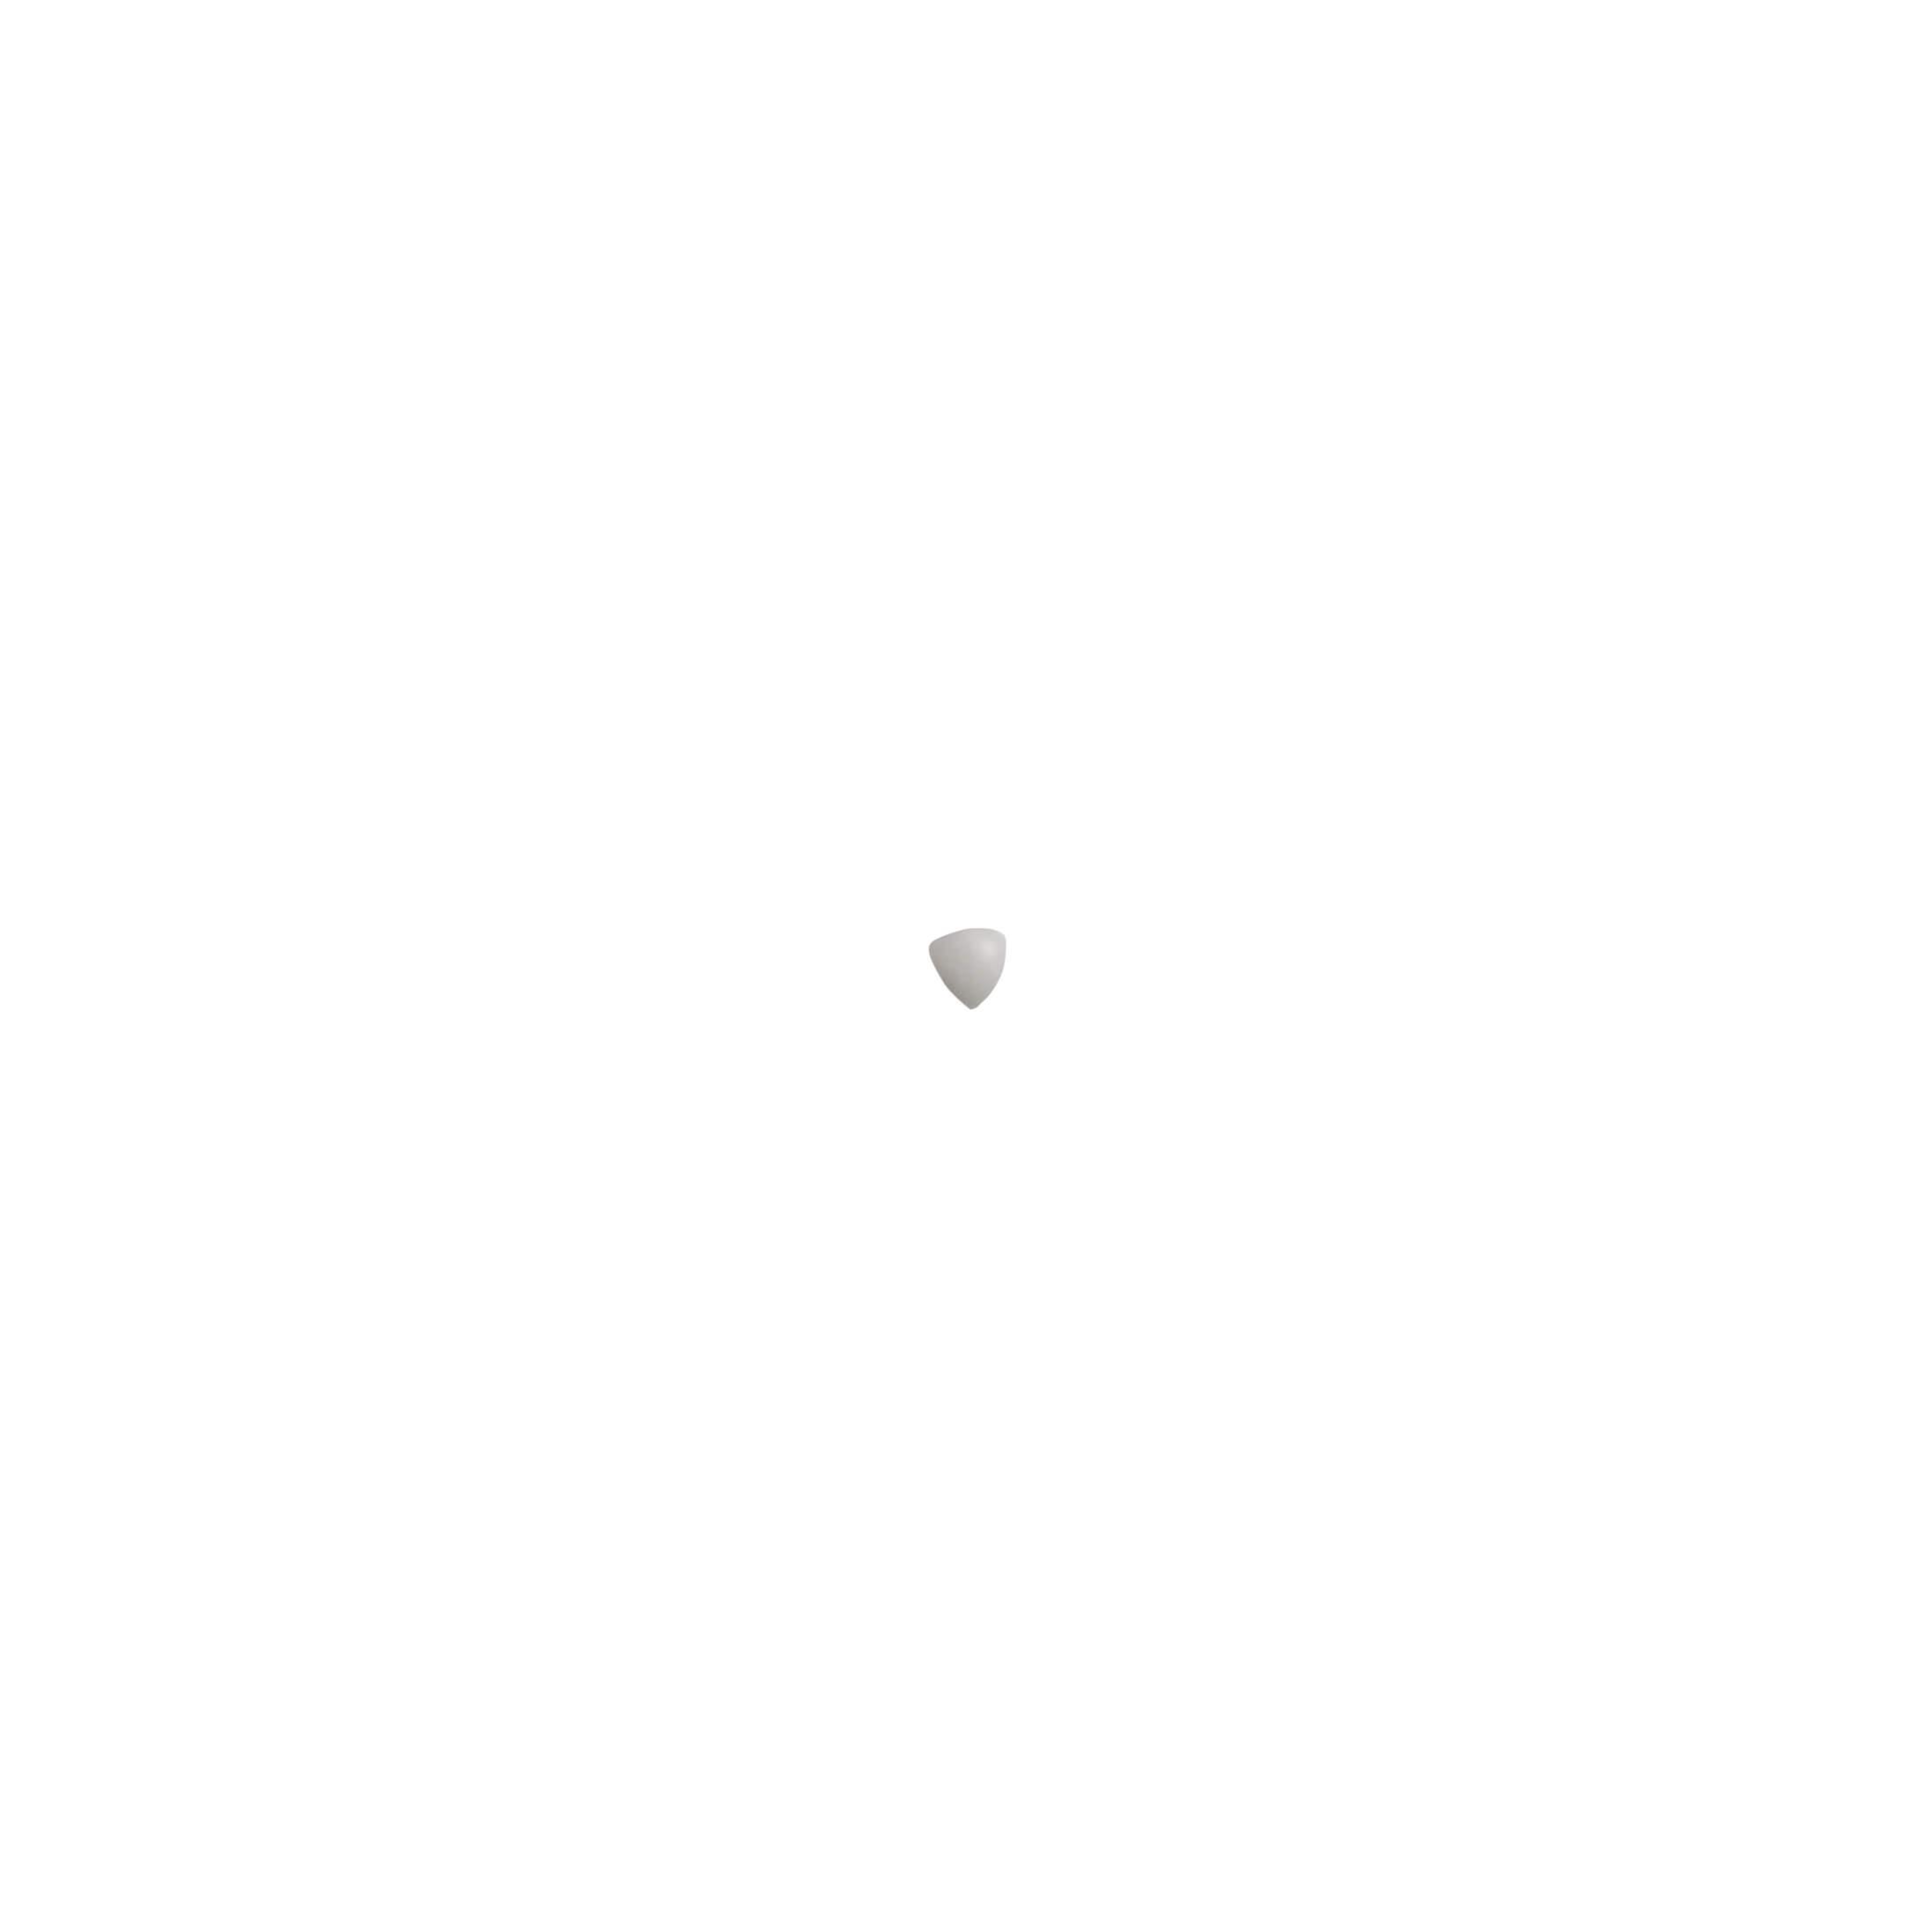 ADEH5048 - ANGULO BULLNOSE TRIM - 1.2 cm X 15 cm